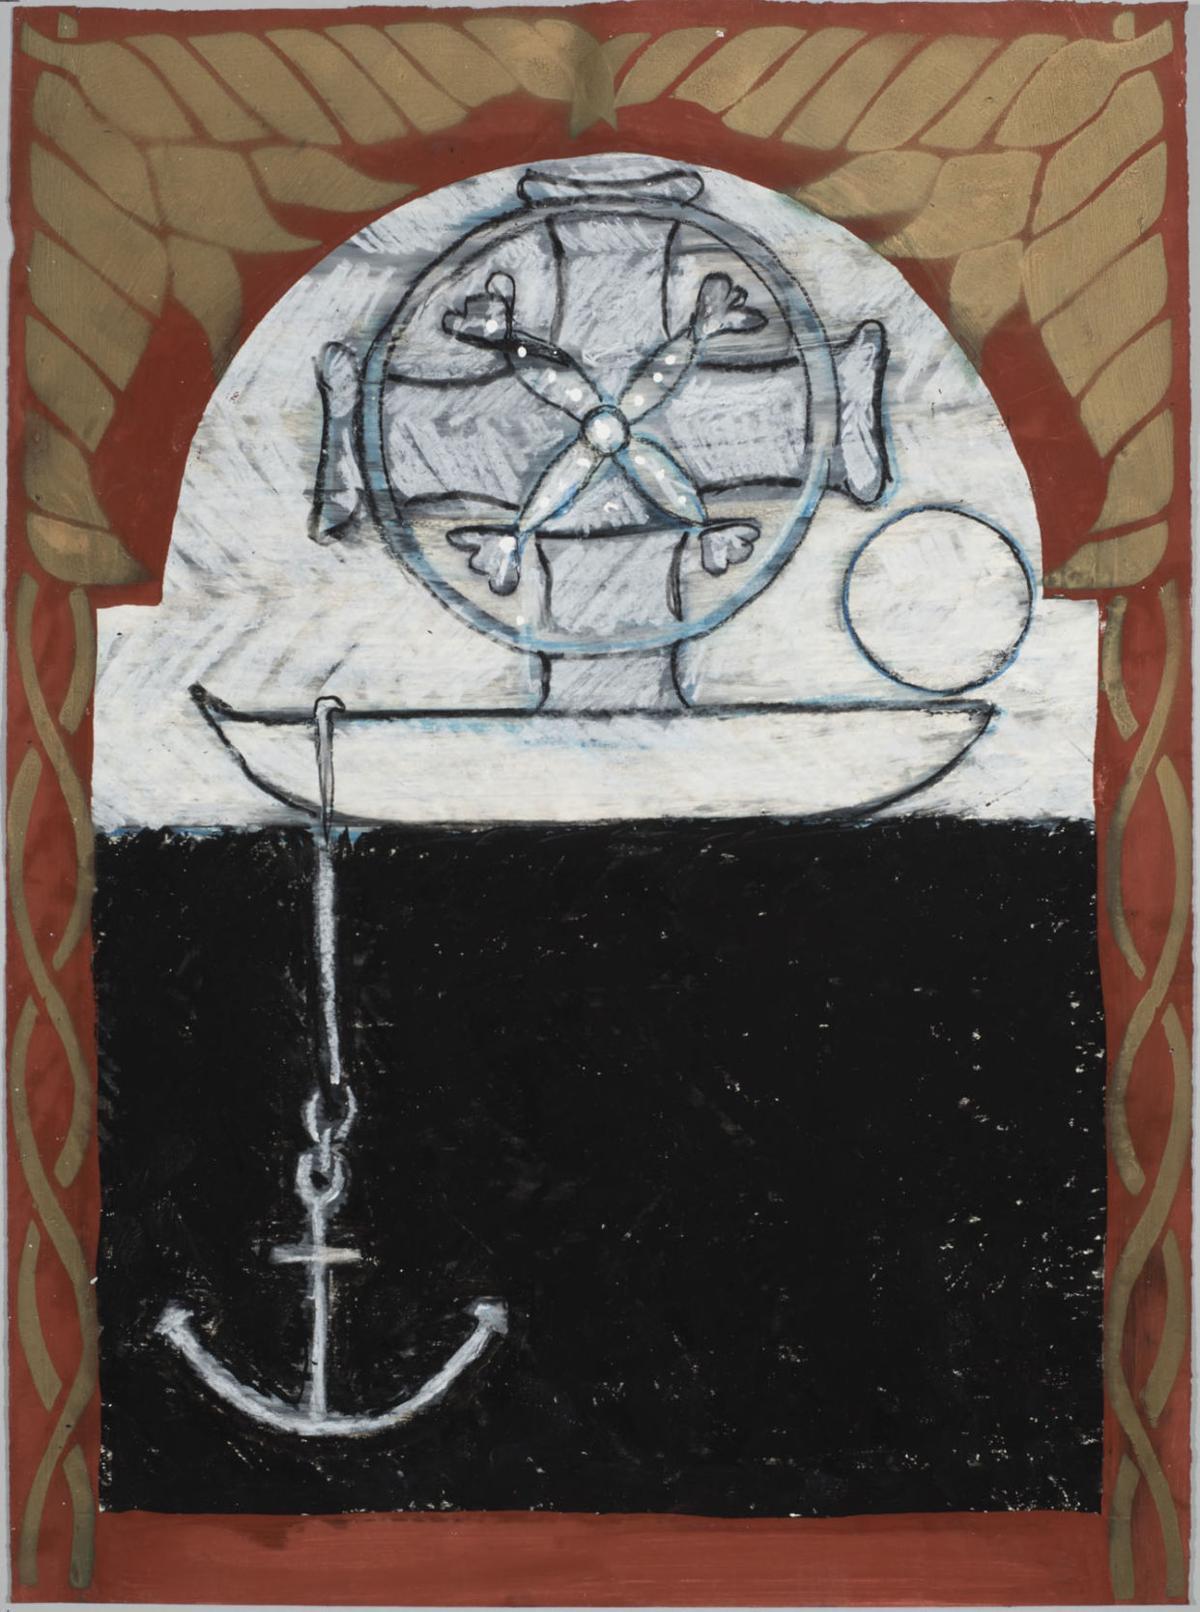 Stephen Glueckert's Bible